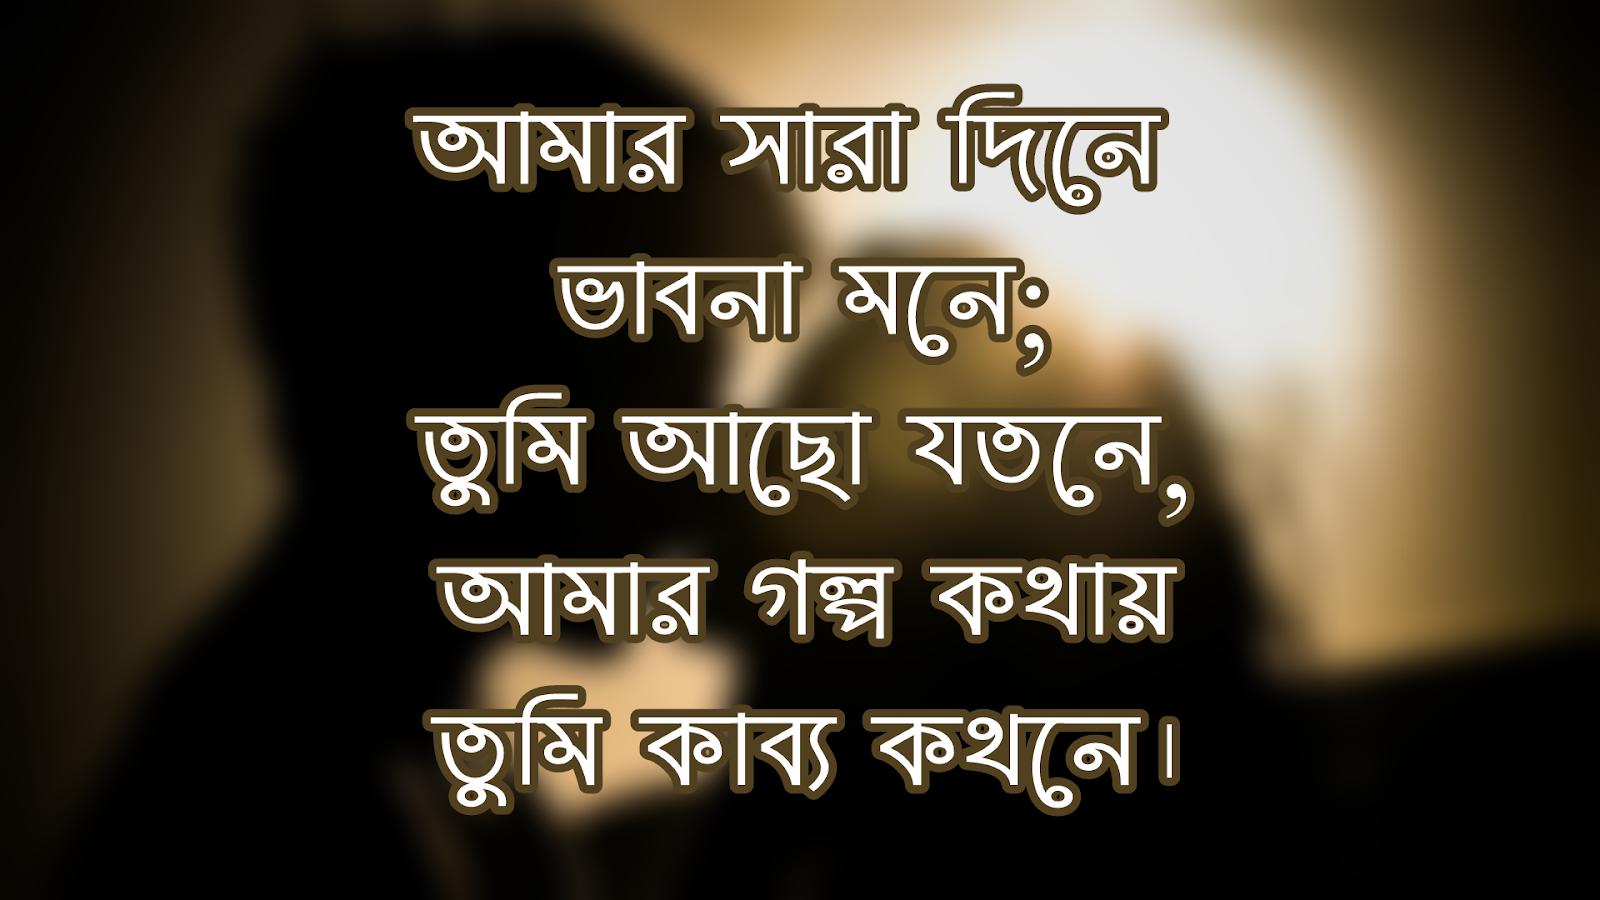 Bangla love sms 2019 [একদম নতুন] - Kobita Asor